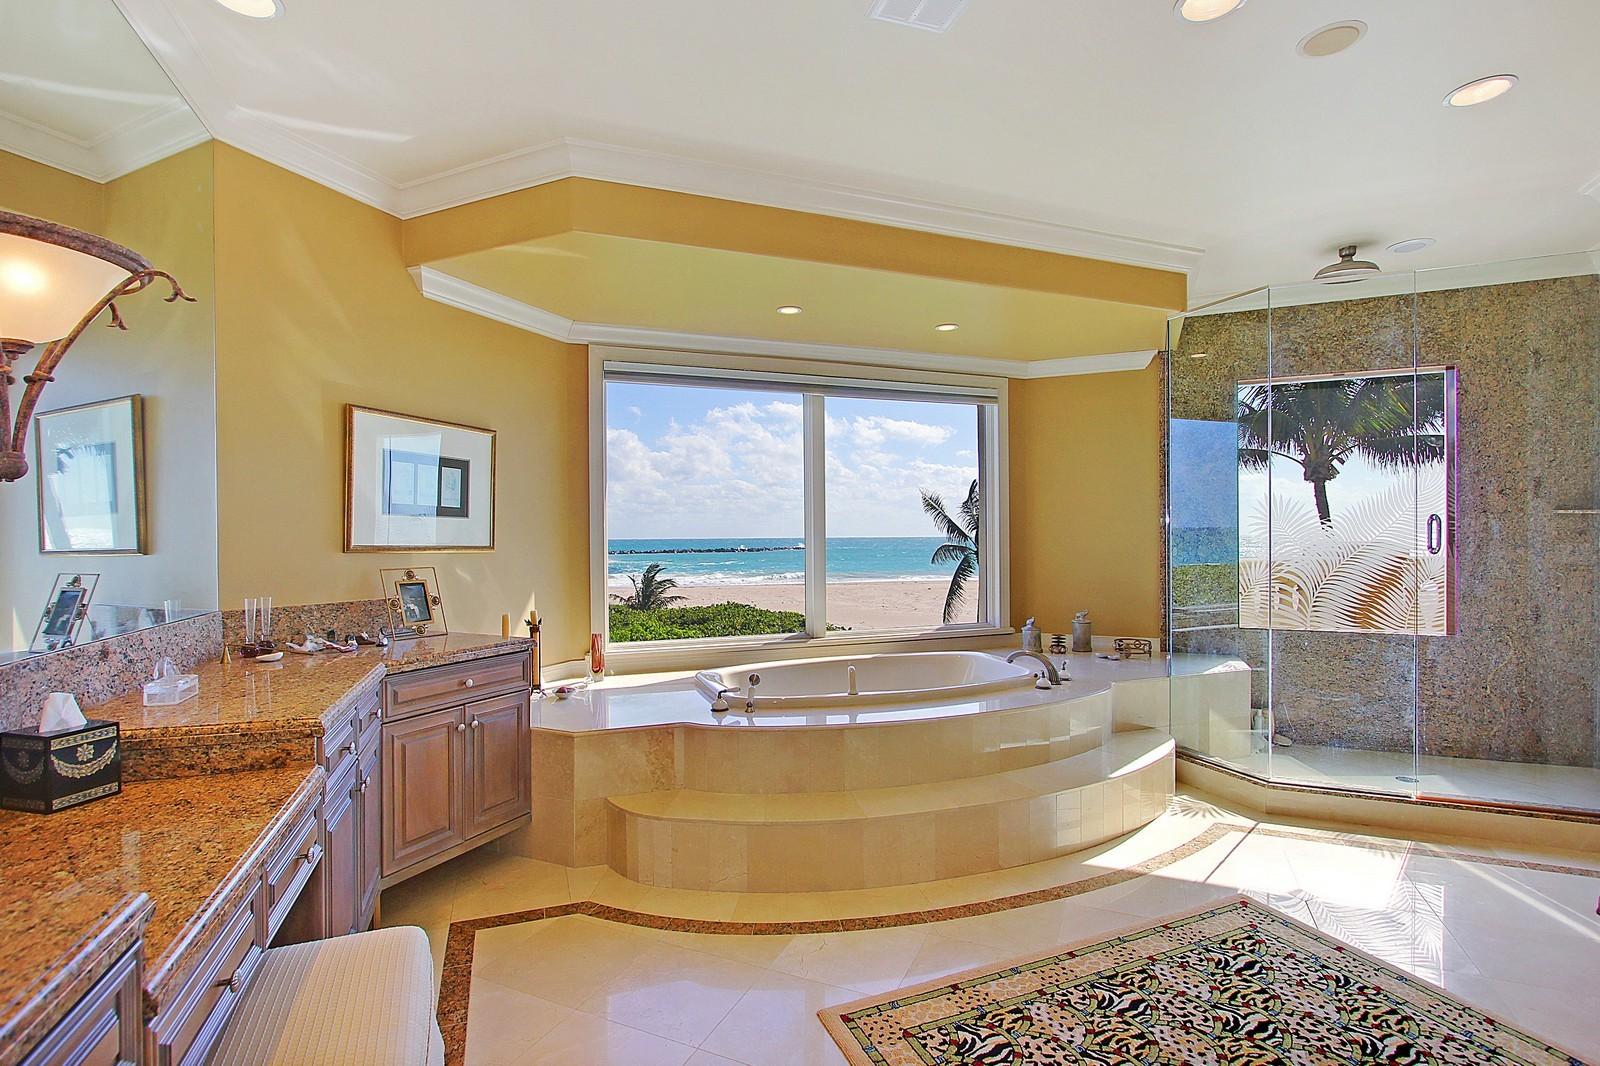 Real Estate Photography - 3097 SE Island Point Ln, Stuart, FL, 34996 - Master Bathroom